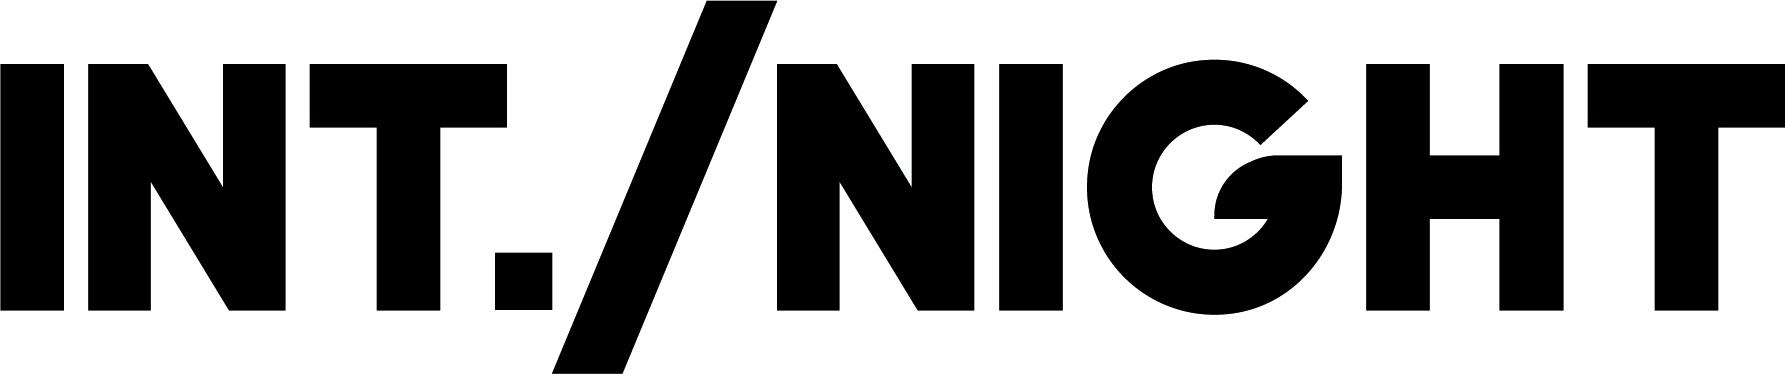 Int Night logo-JPG.jpg